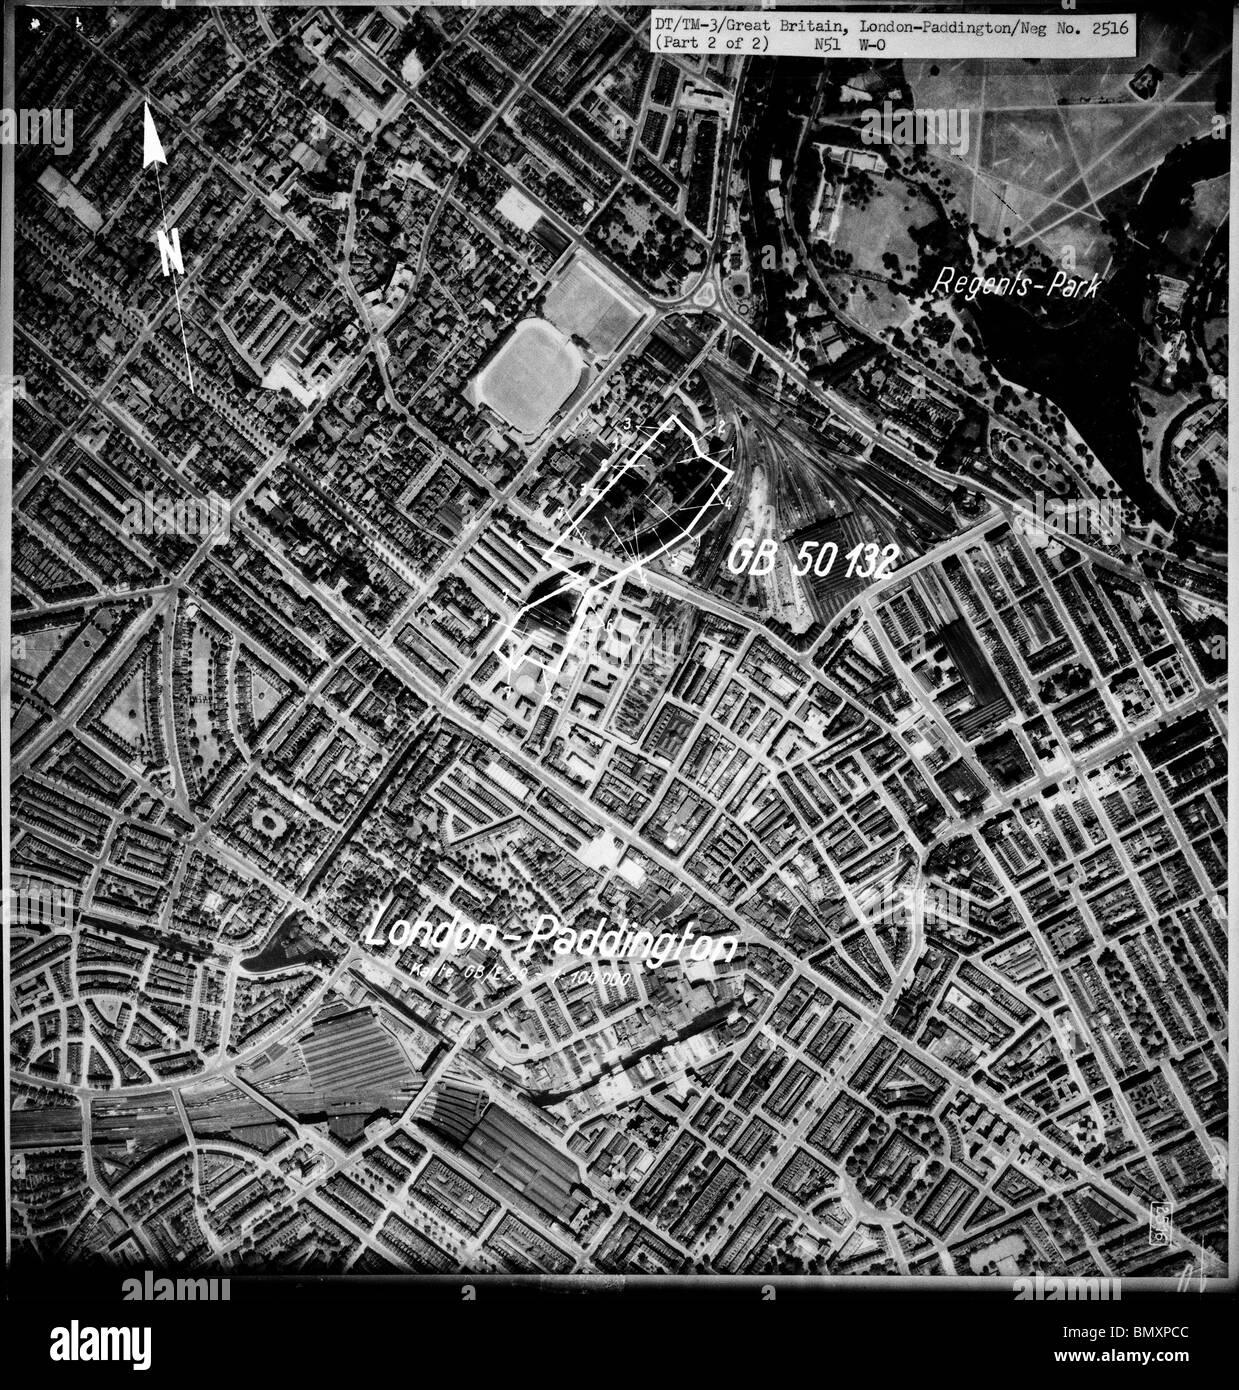 London Paddington 1939 Railway Station Power Station Lords